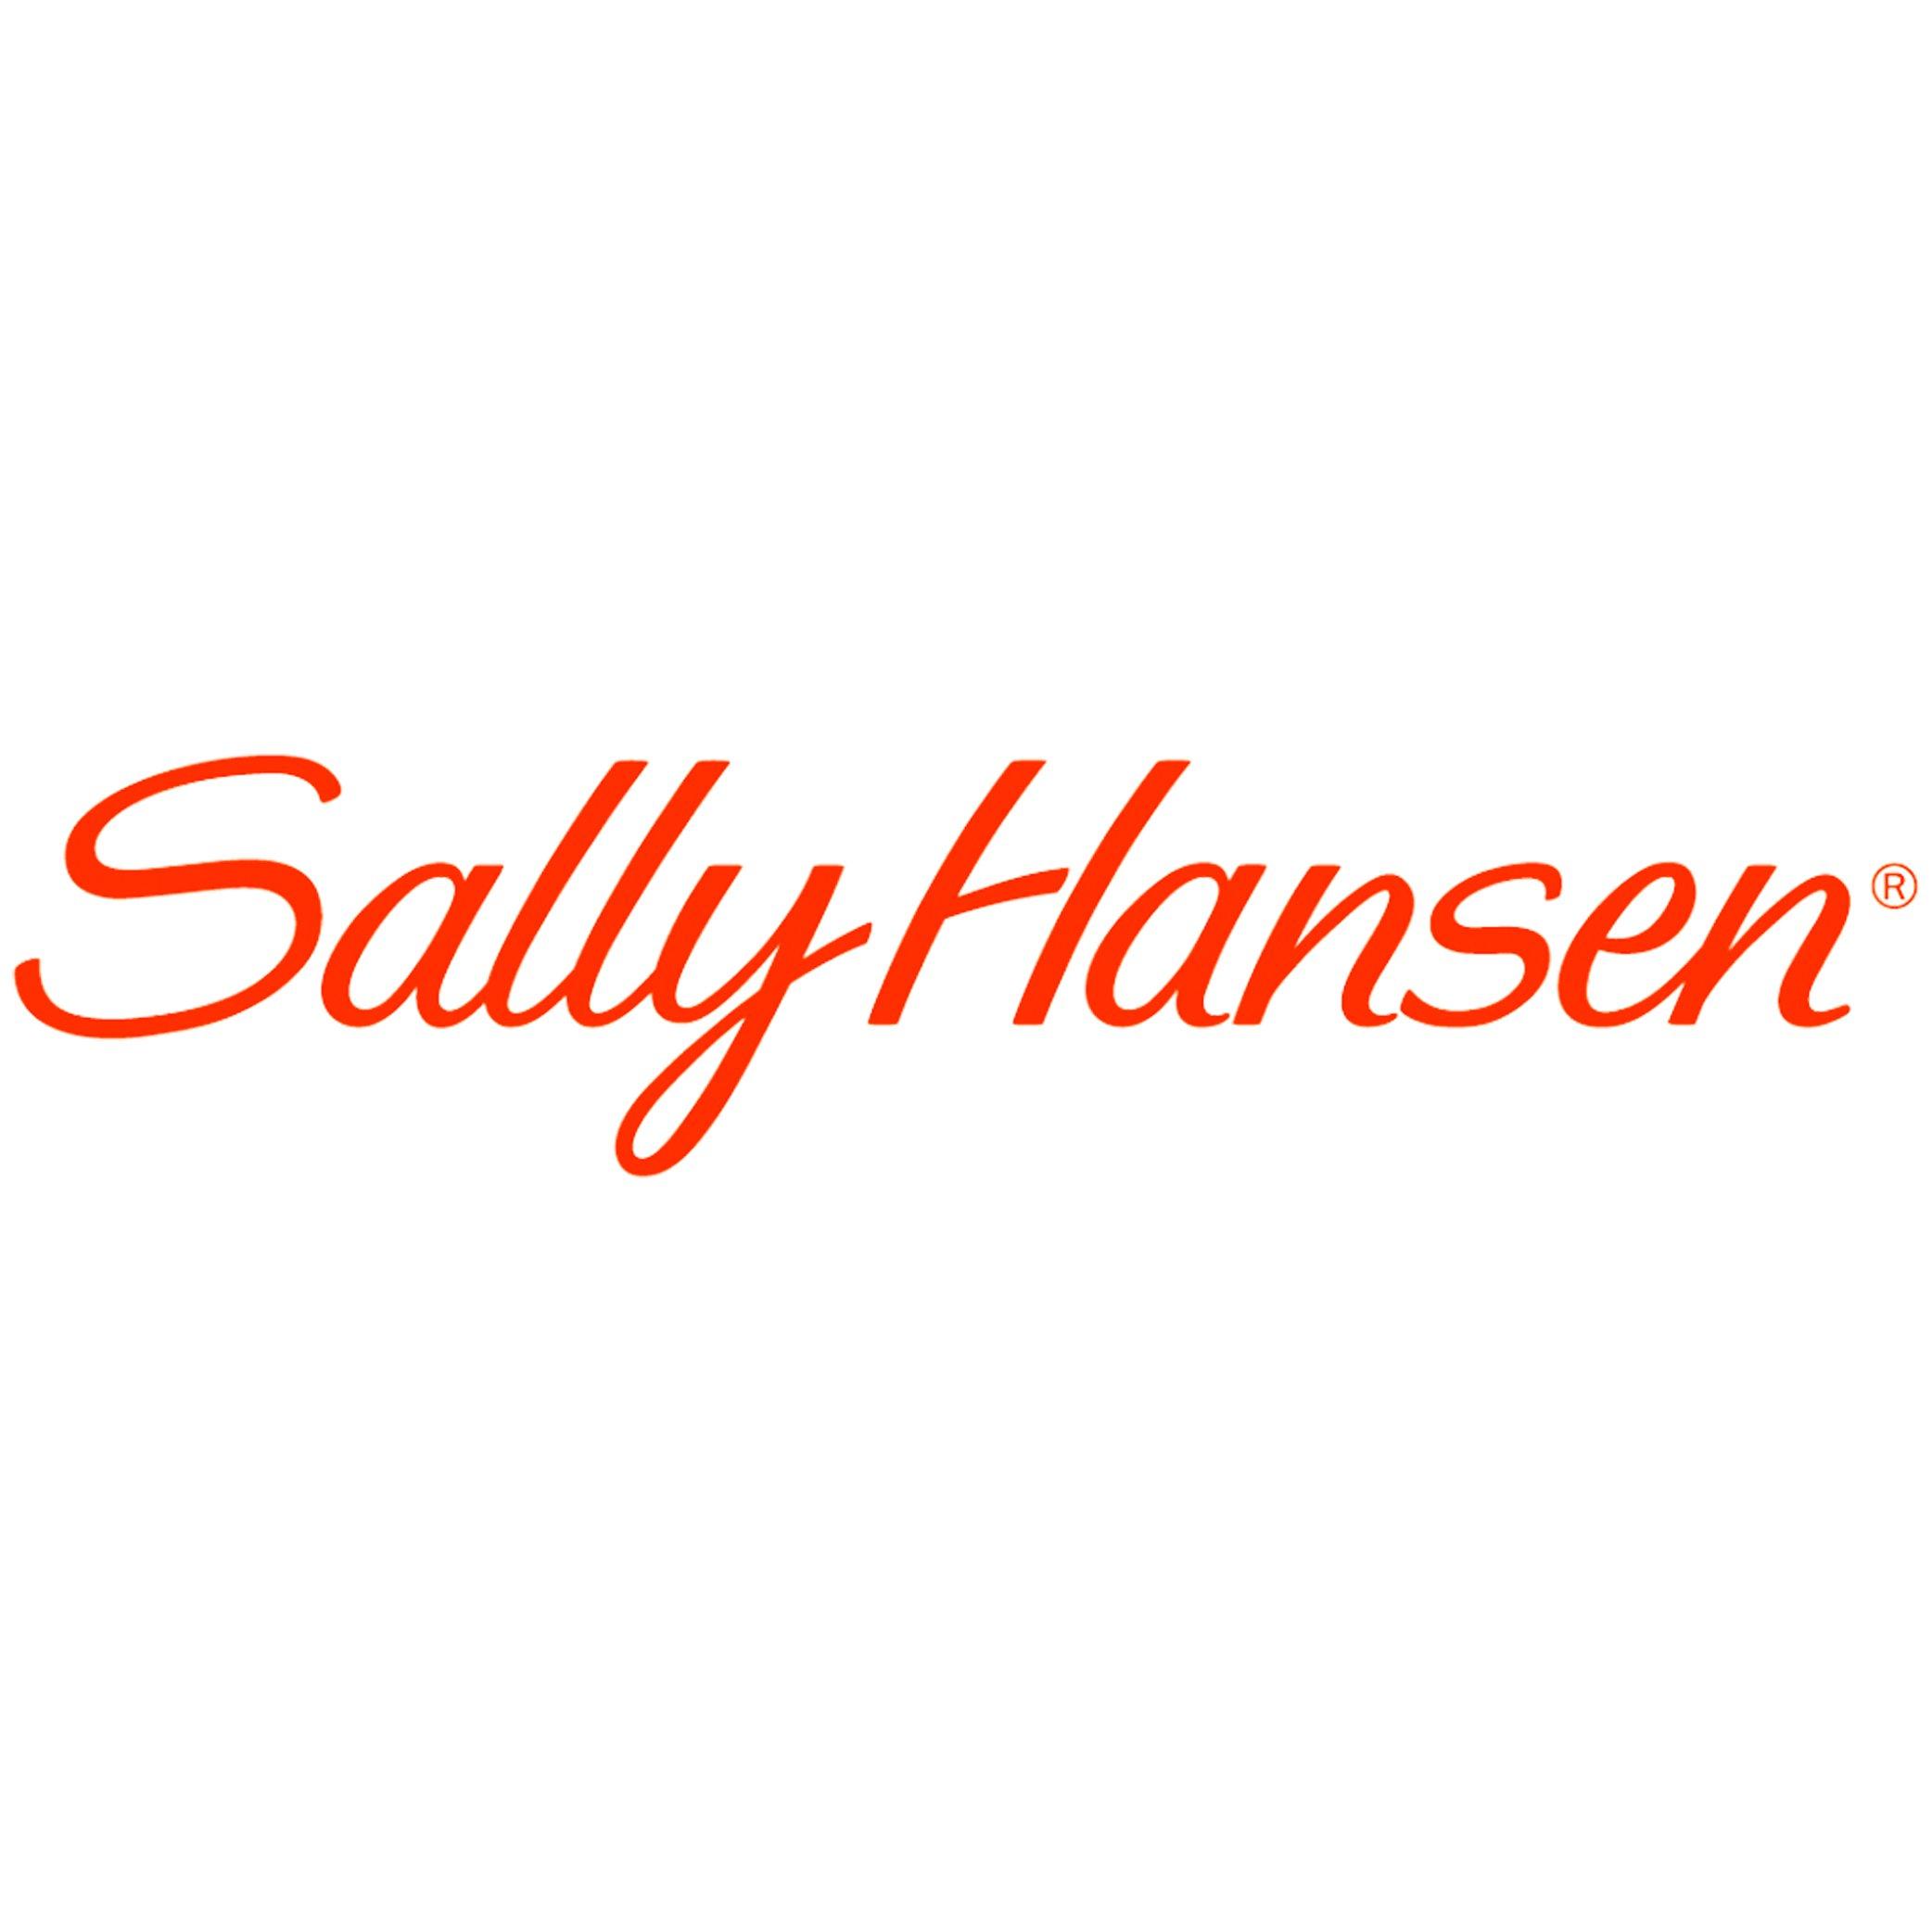 Sally Hansen's logo